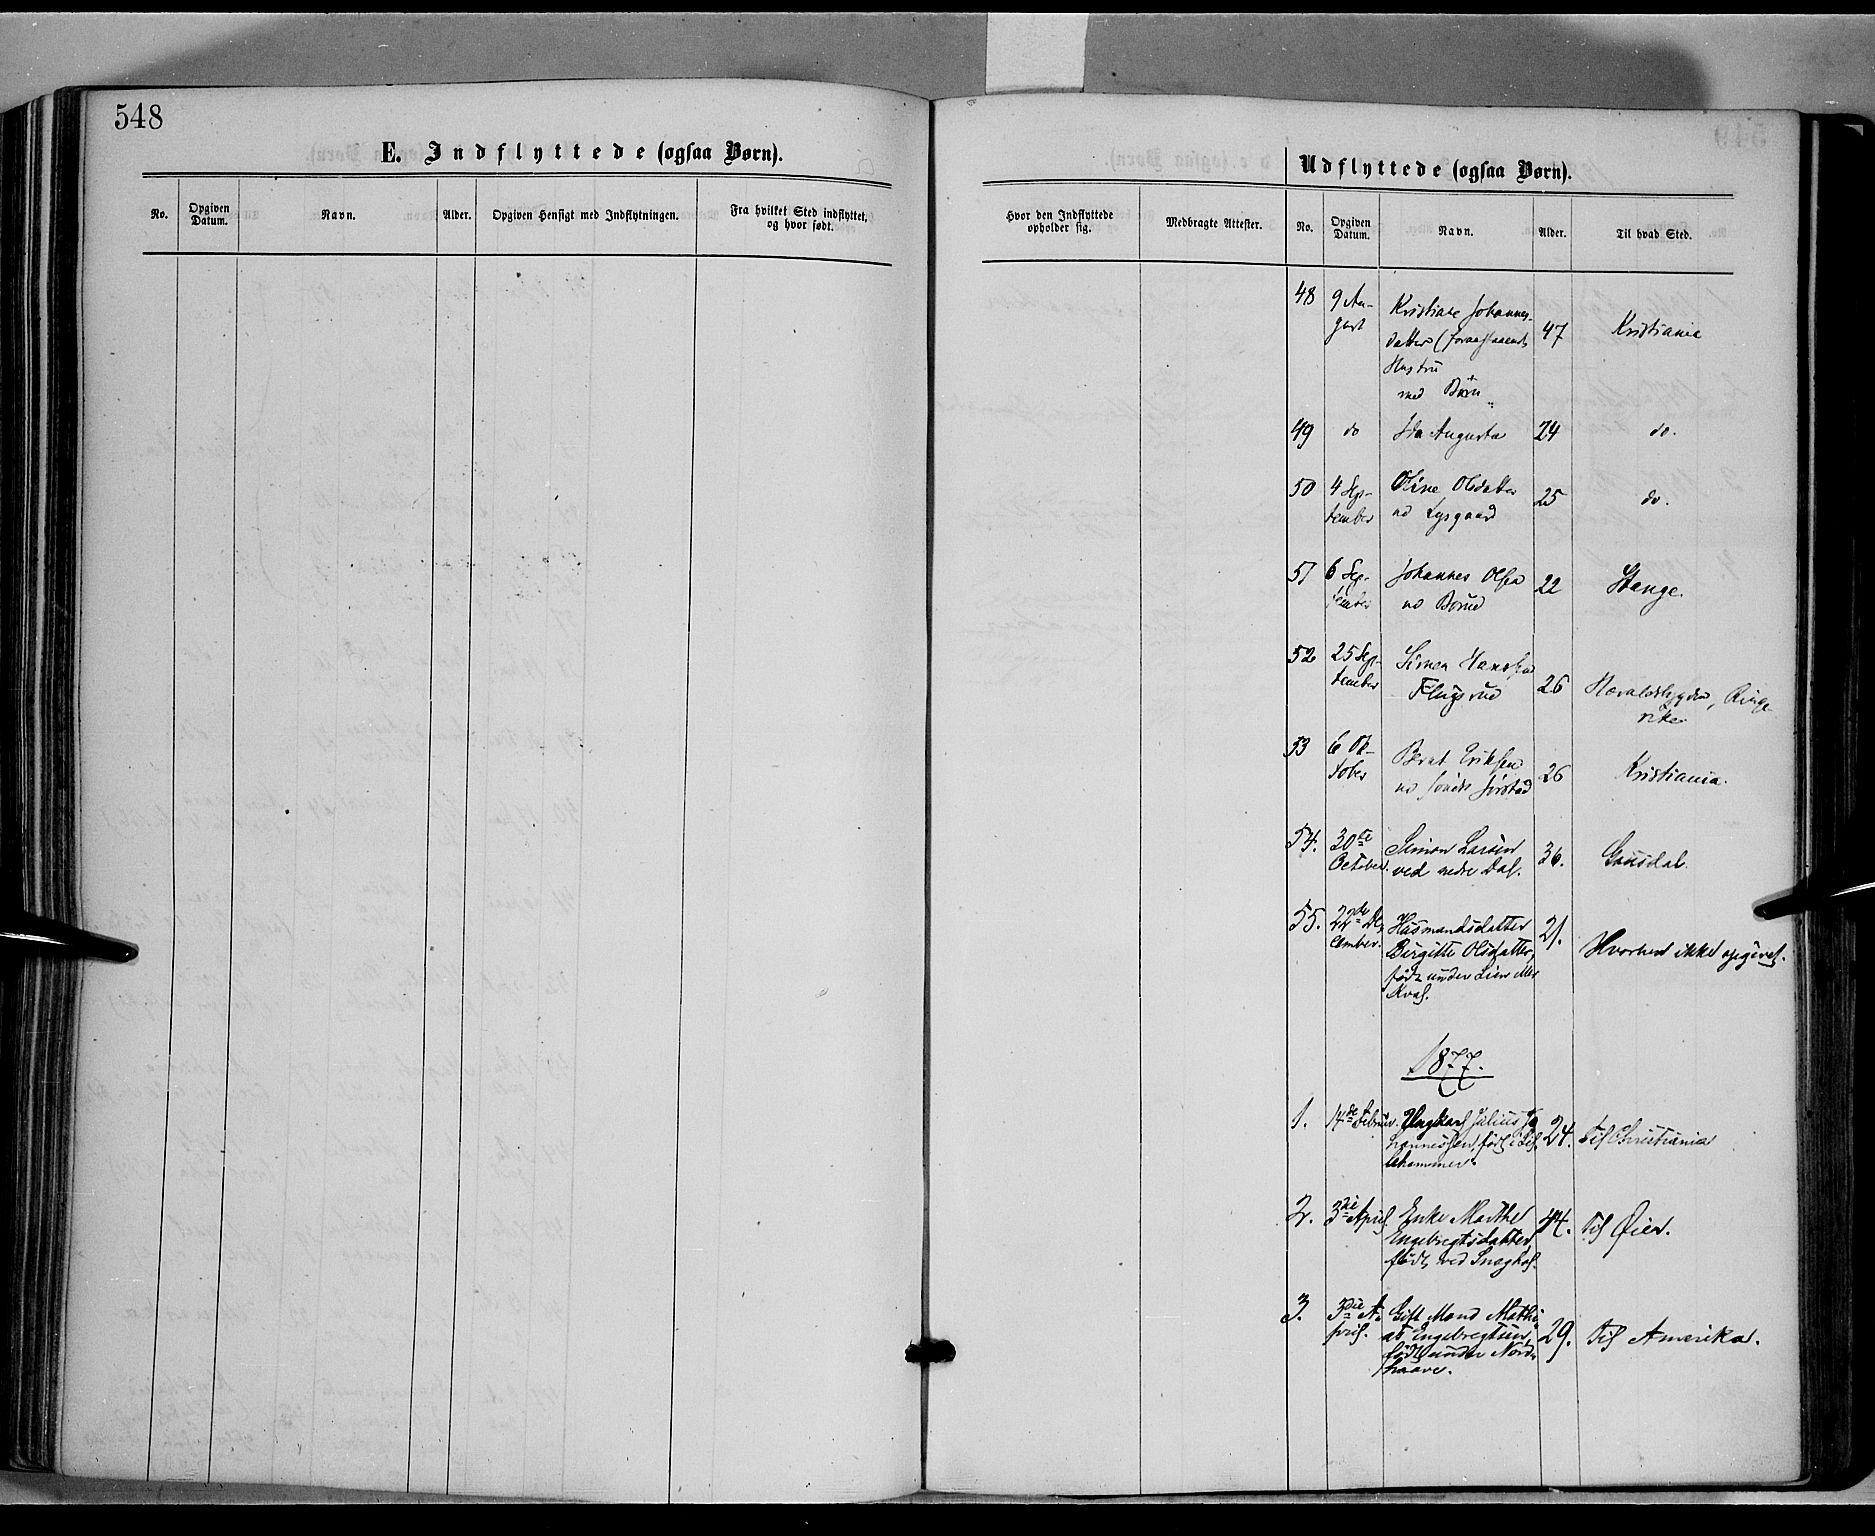 SAH, Fåberg prestekontor, Ministerialbok nr. 7, 1868-1878, s. 548